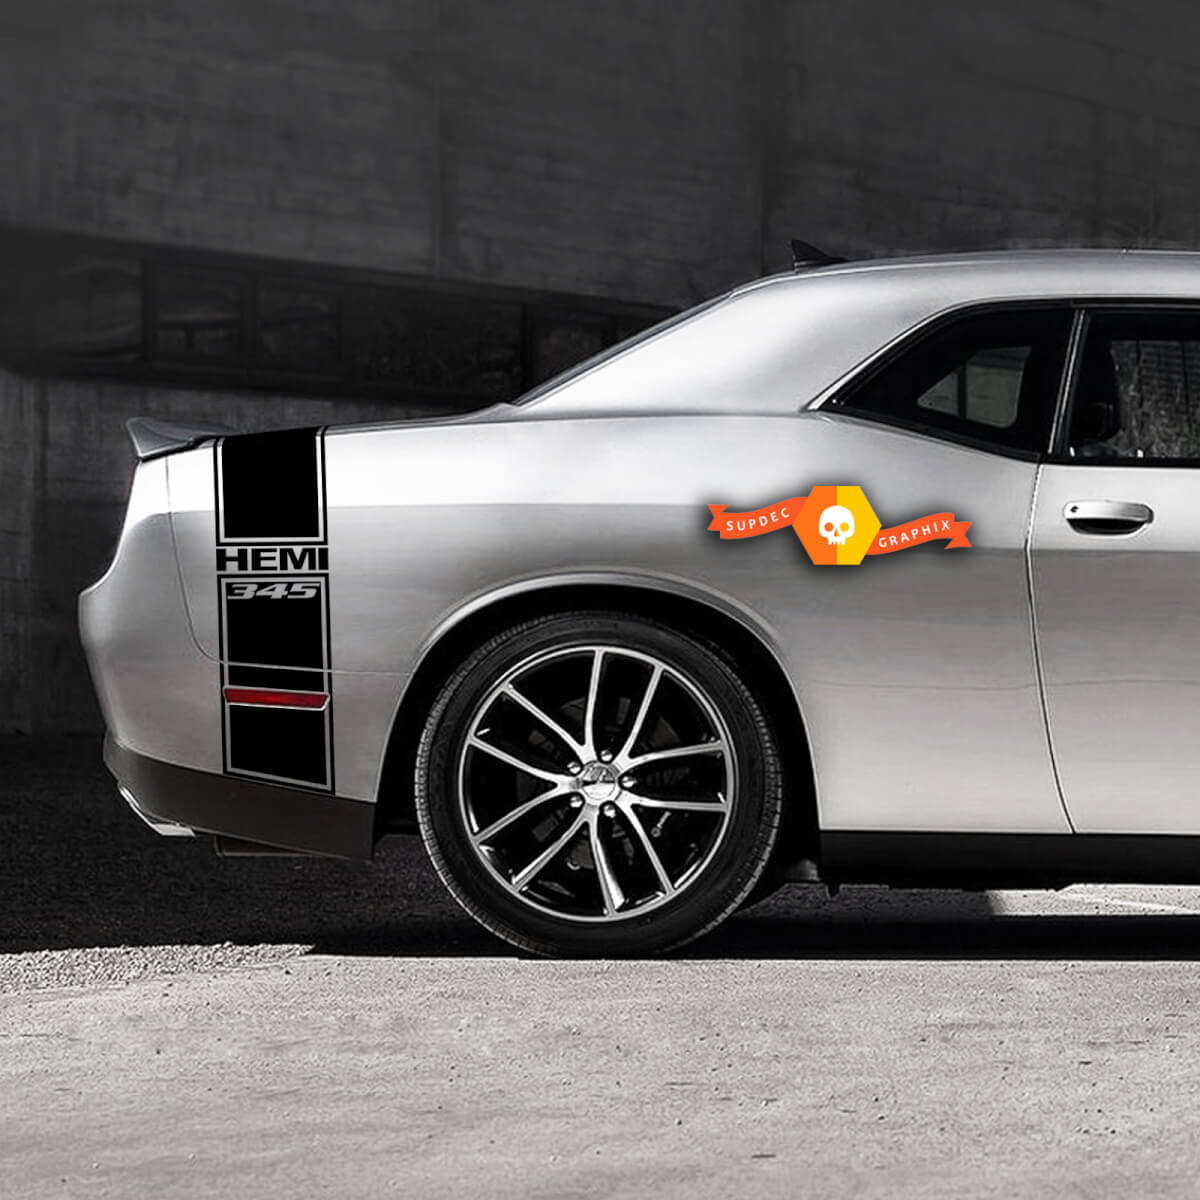 Dodge Challenger Hemi 345 Schwanzband Aufkleber Grafiken passt zu Modellen